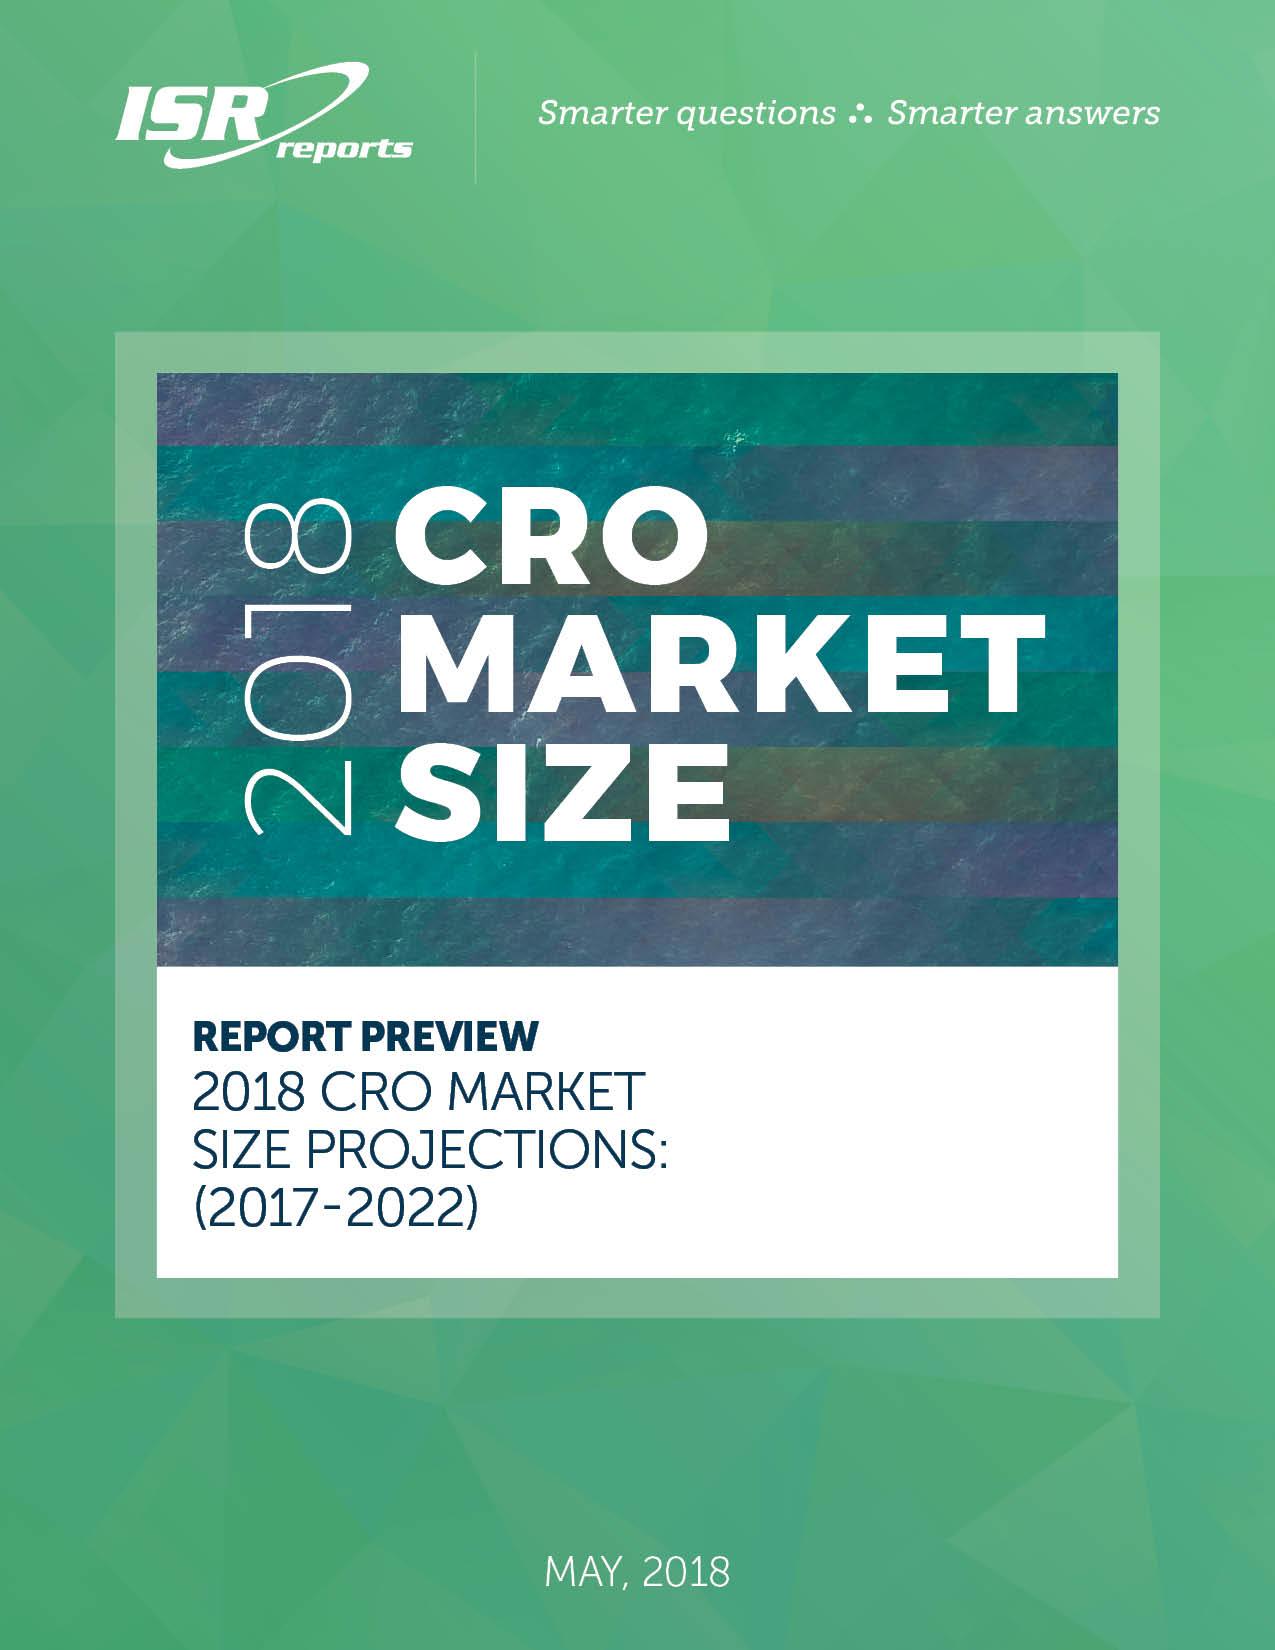 CRO Market Size